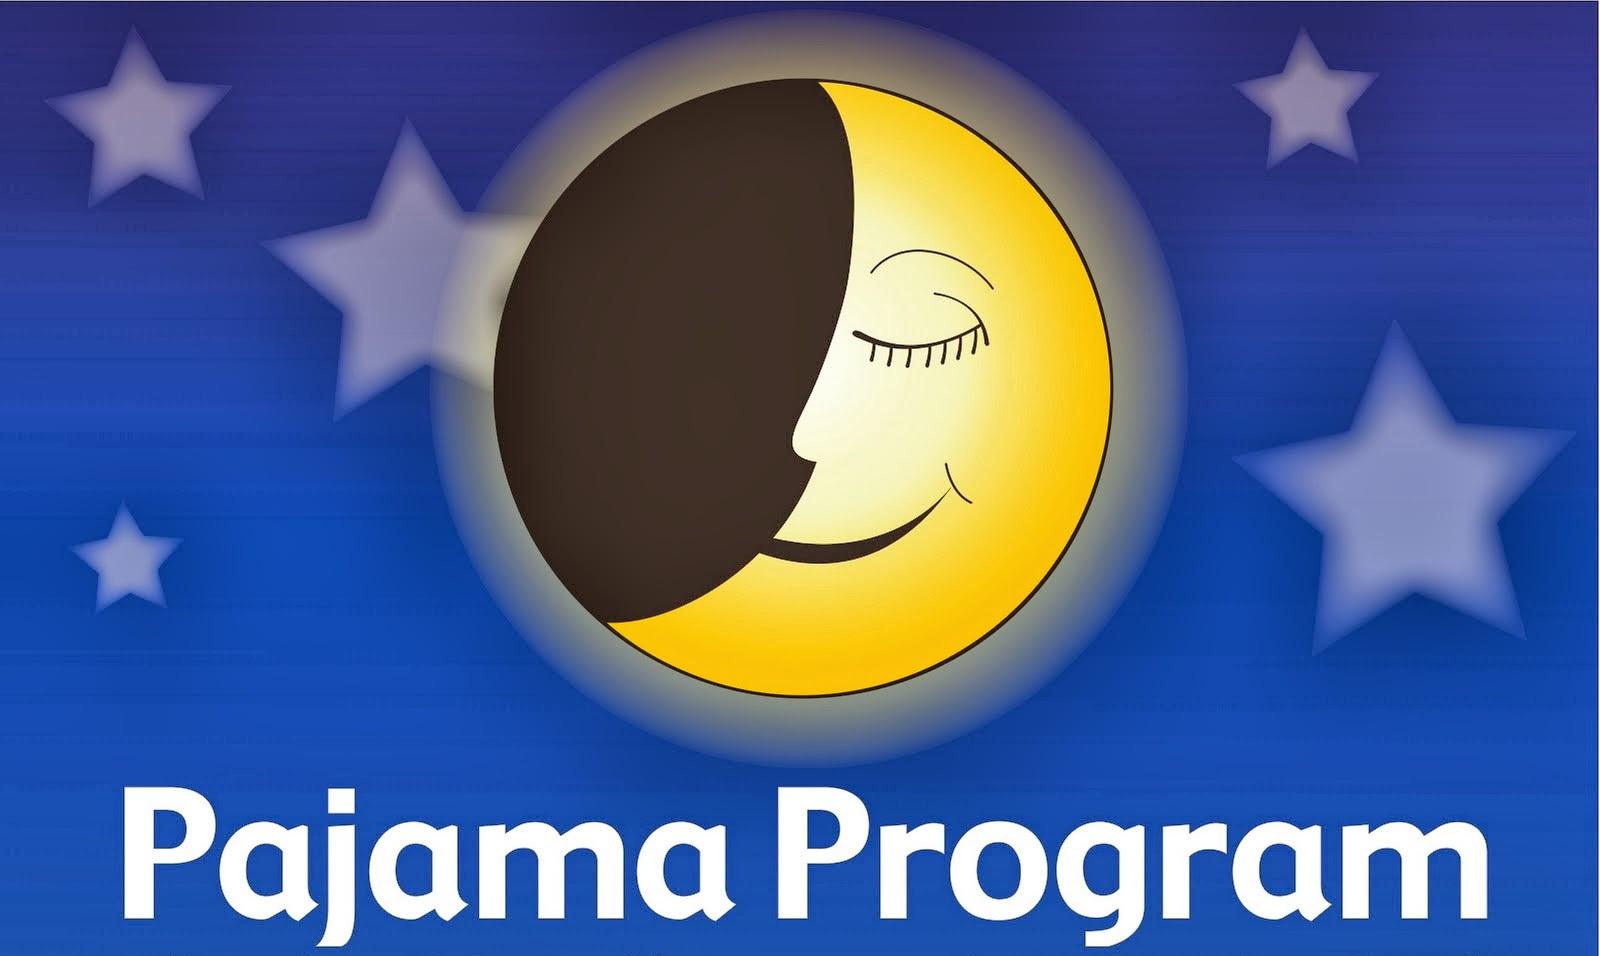 PajamaProgram_logo.jpg